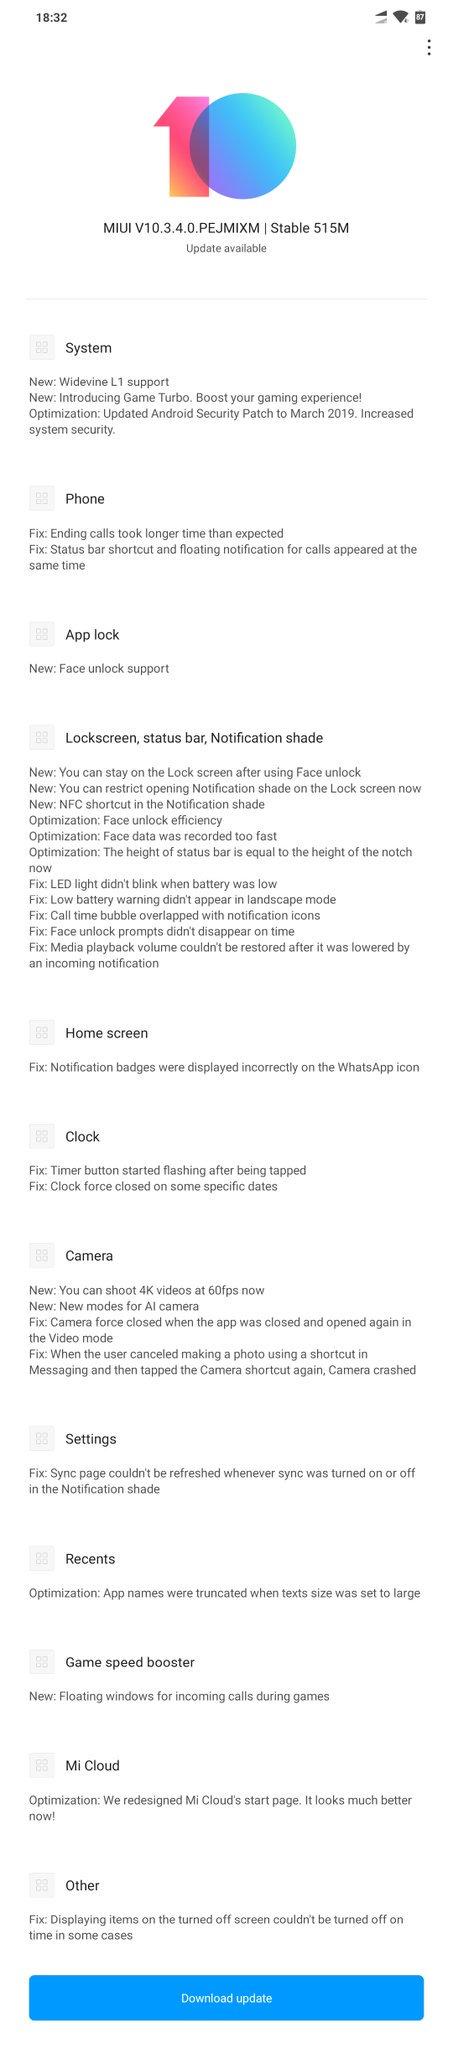 MIUI v10.3.4.0.PEJMIXM POCOPHONE F1 xiaomi noticias adictos